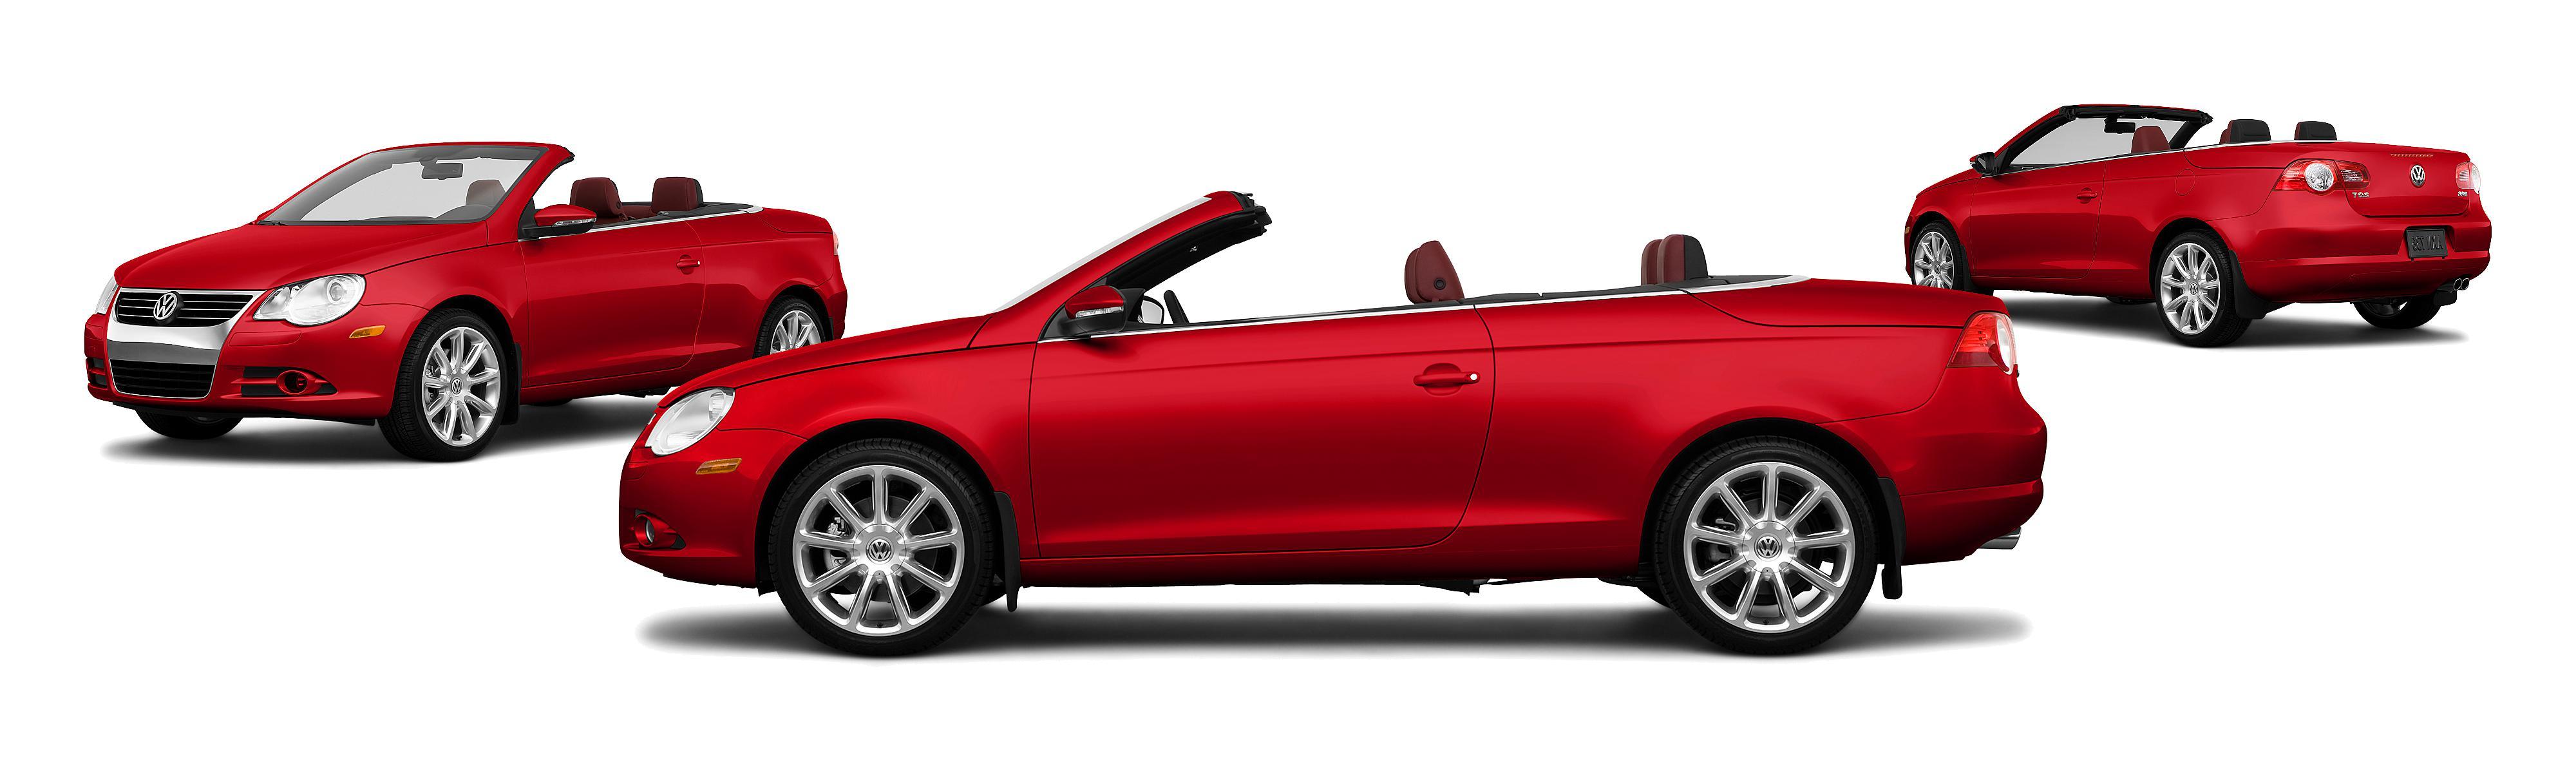 vehicle motors convertible logic listings new beetle se atlanta volkswagen overview